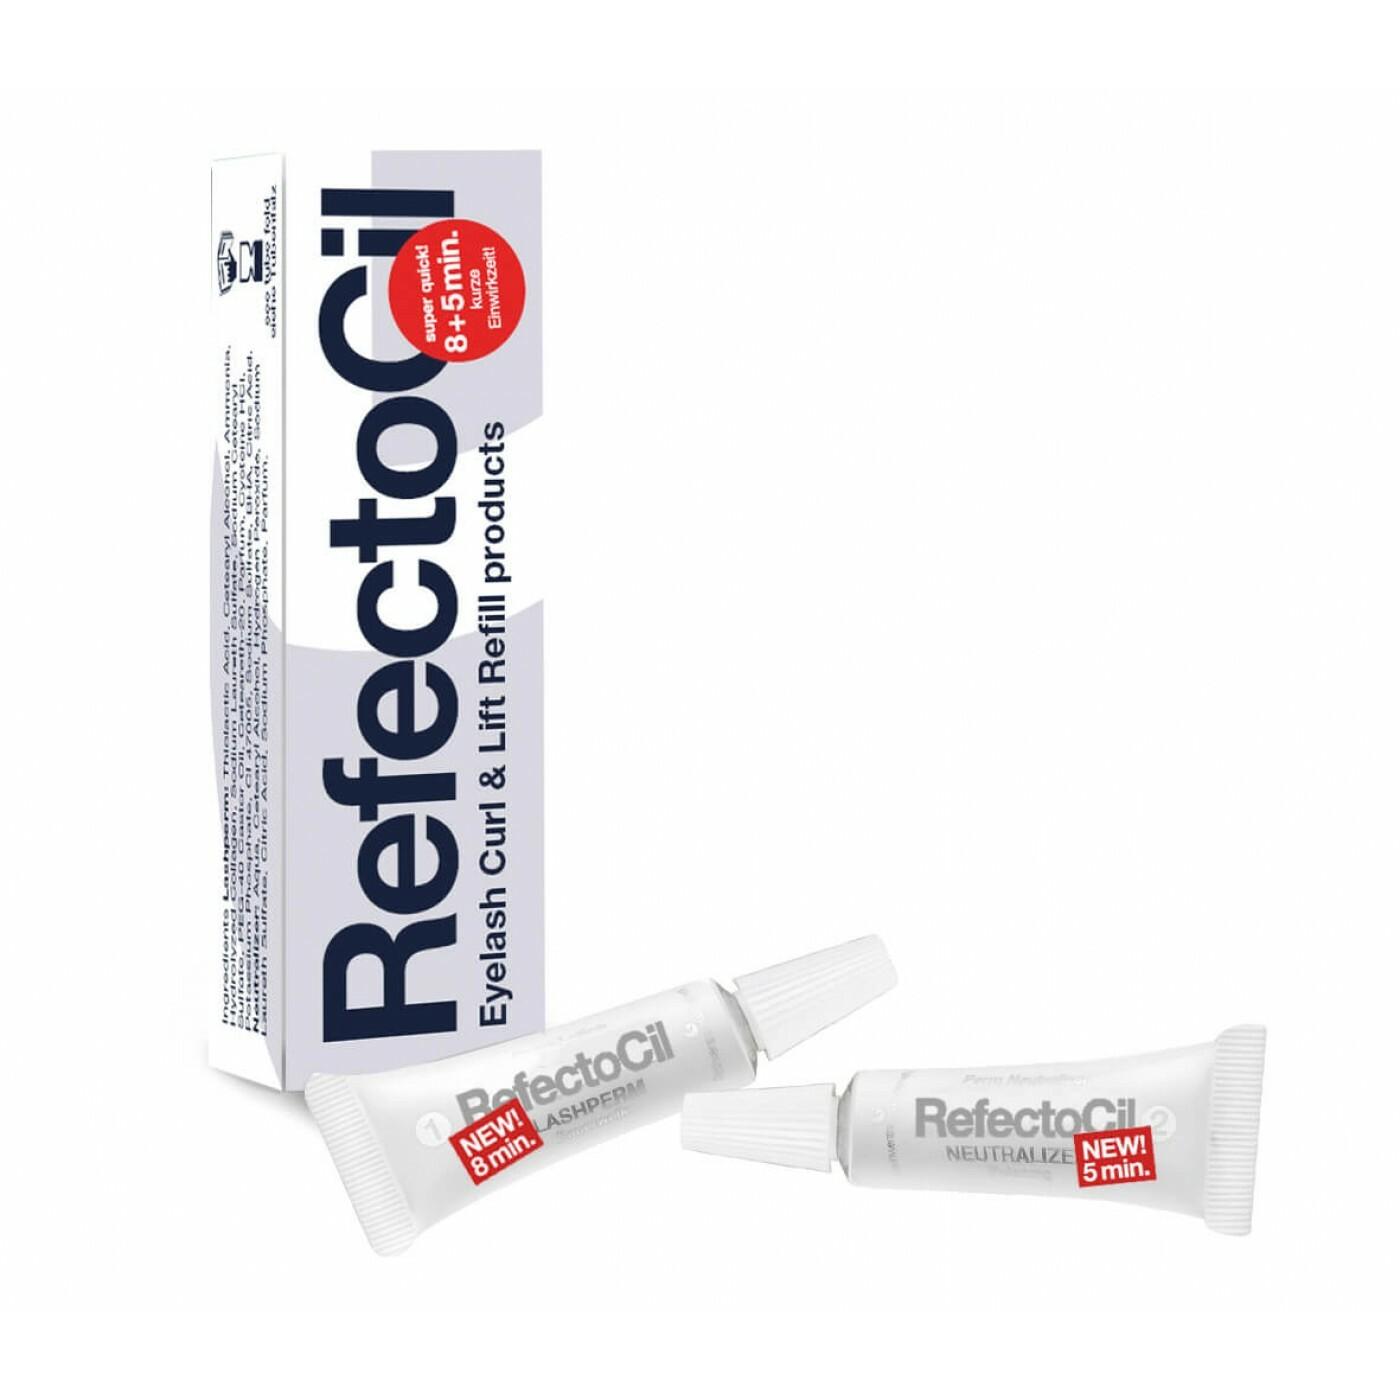 Refectocil Eyelash Curl & Lift Curl Perm/Neutralizer 3,5ml